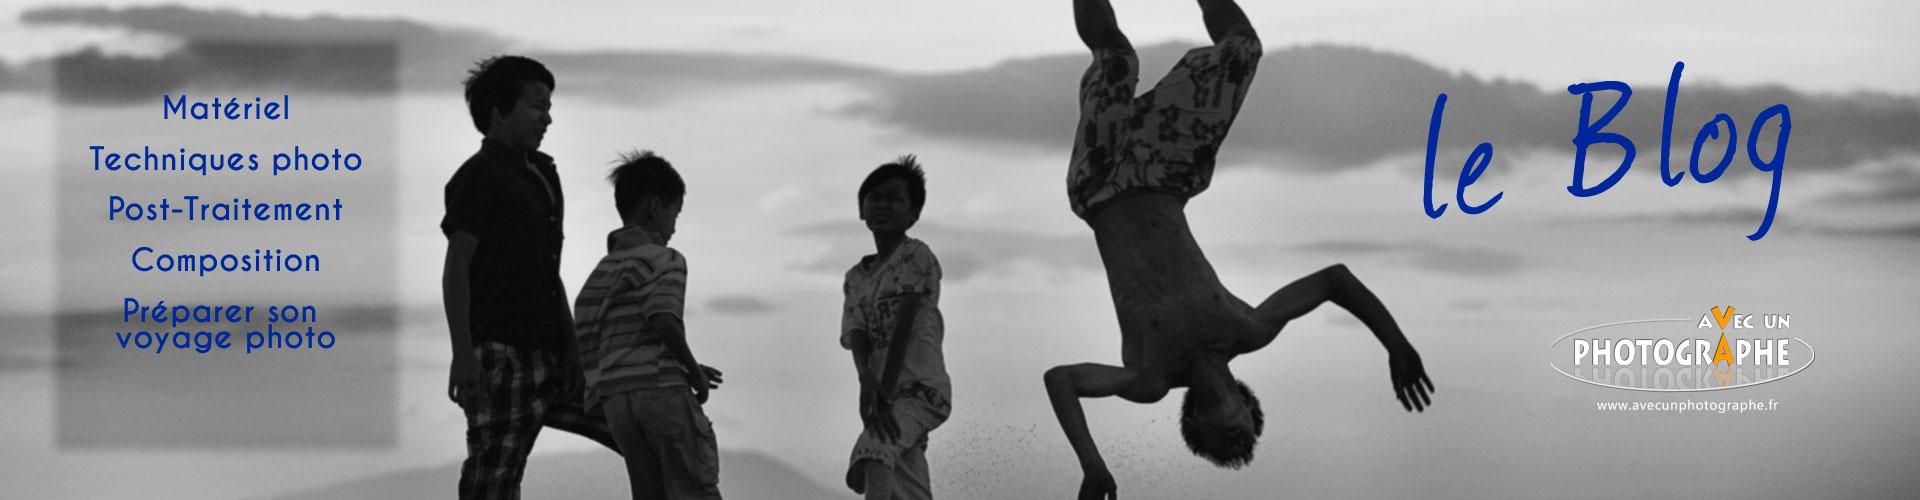 Blog avecunphotographe